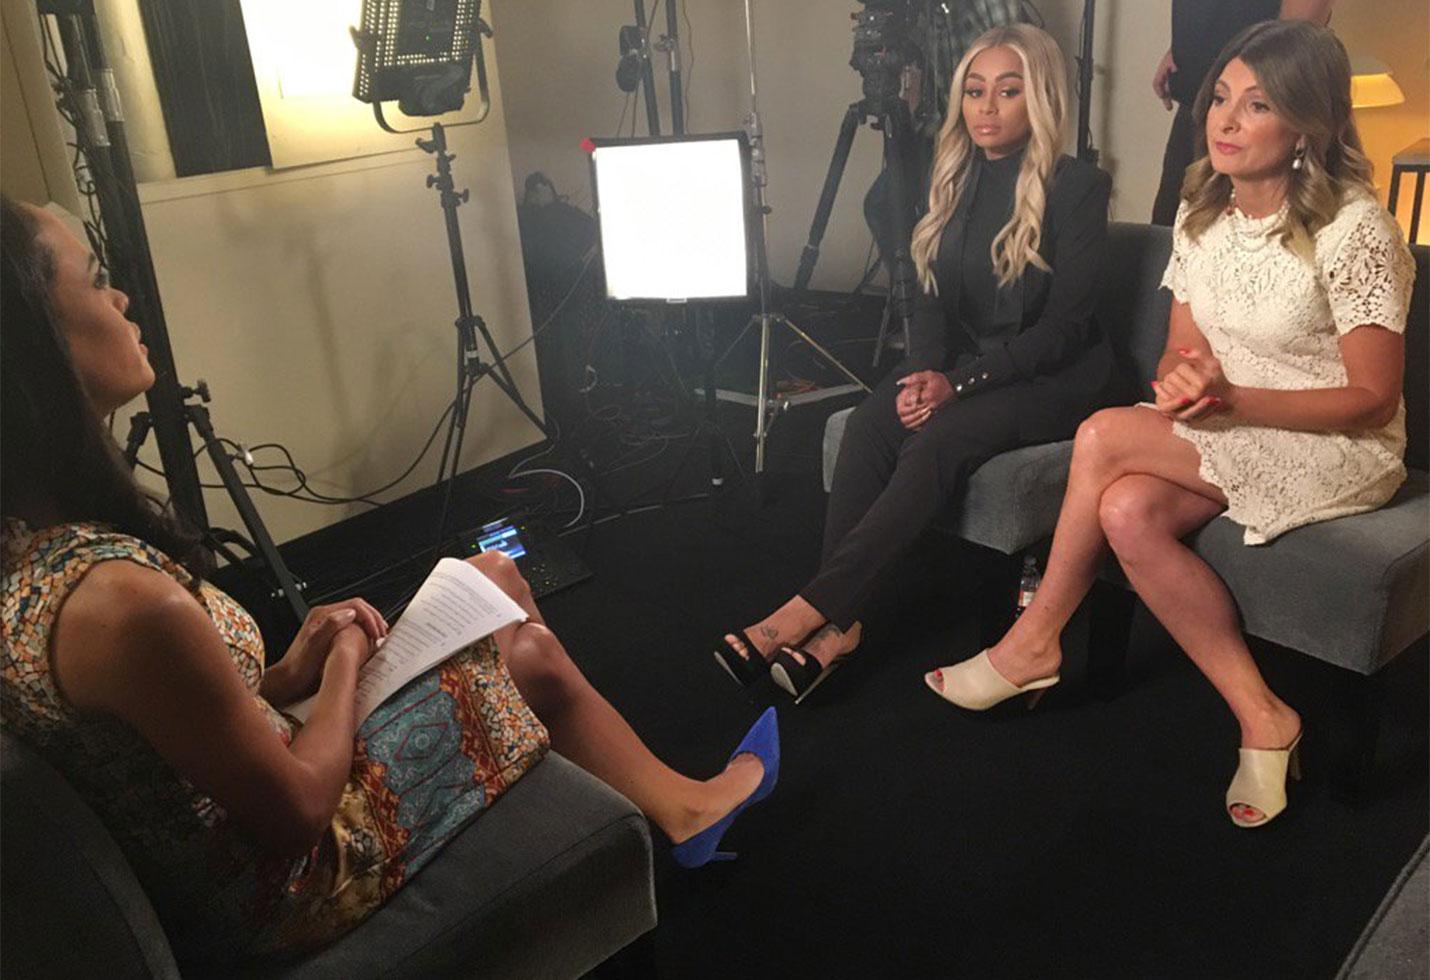 Blac chyna gma interview rob kardashian revenge porn